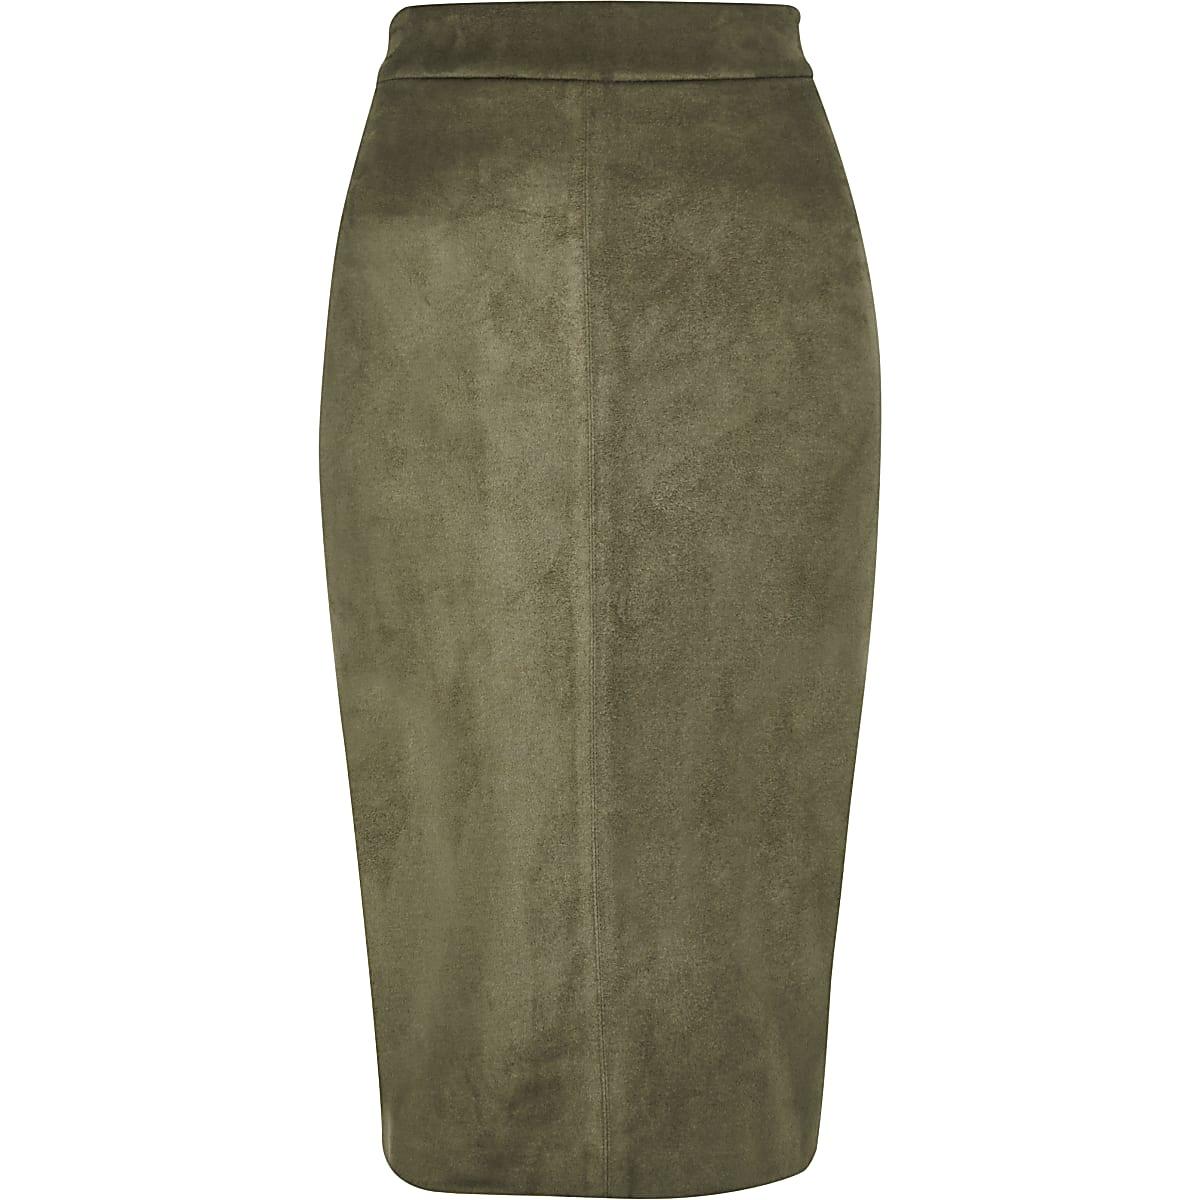 Suede Khaki Women Pencil Skirt Skirts Faux Midi YfyIv6b7g